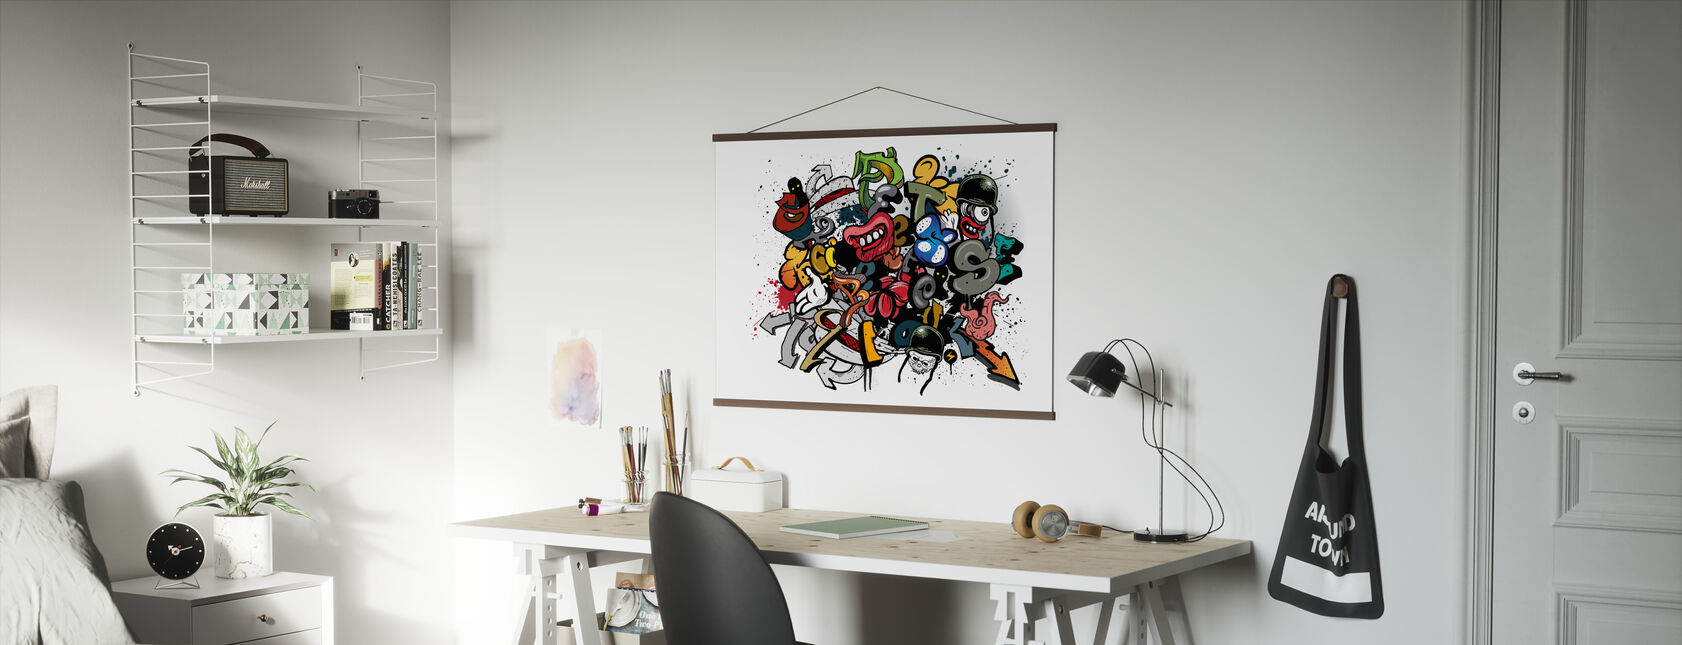 Graffiti element - Poster - Kontor